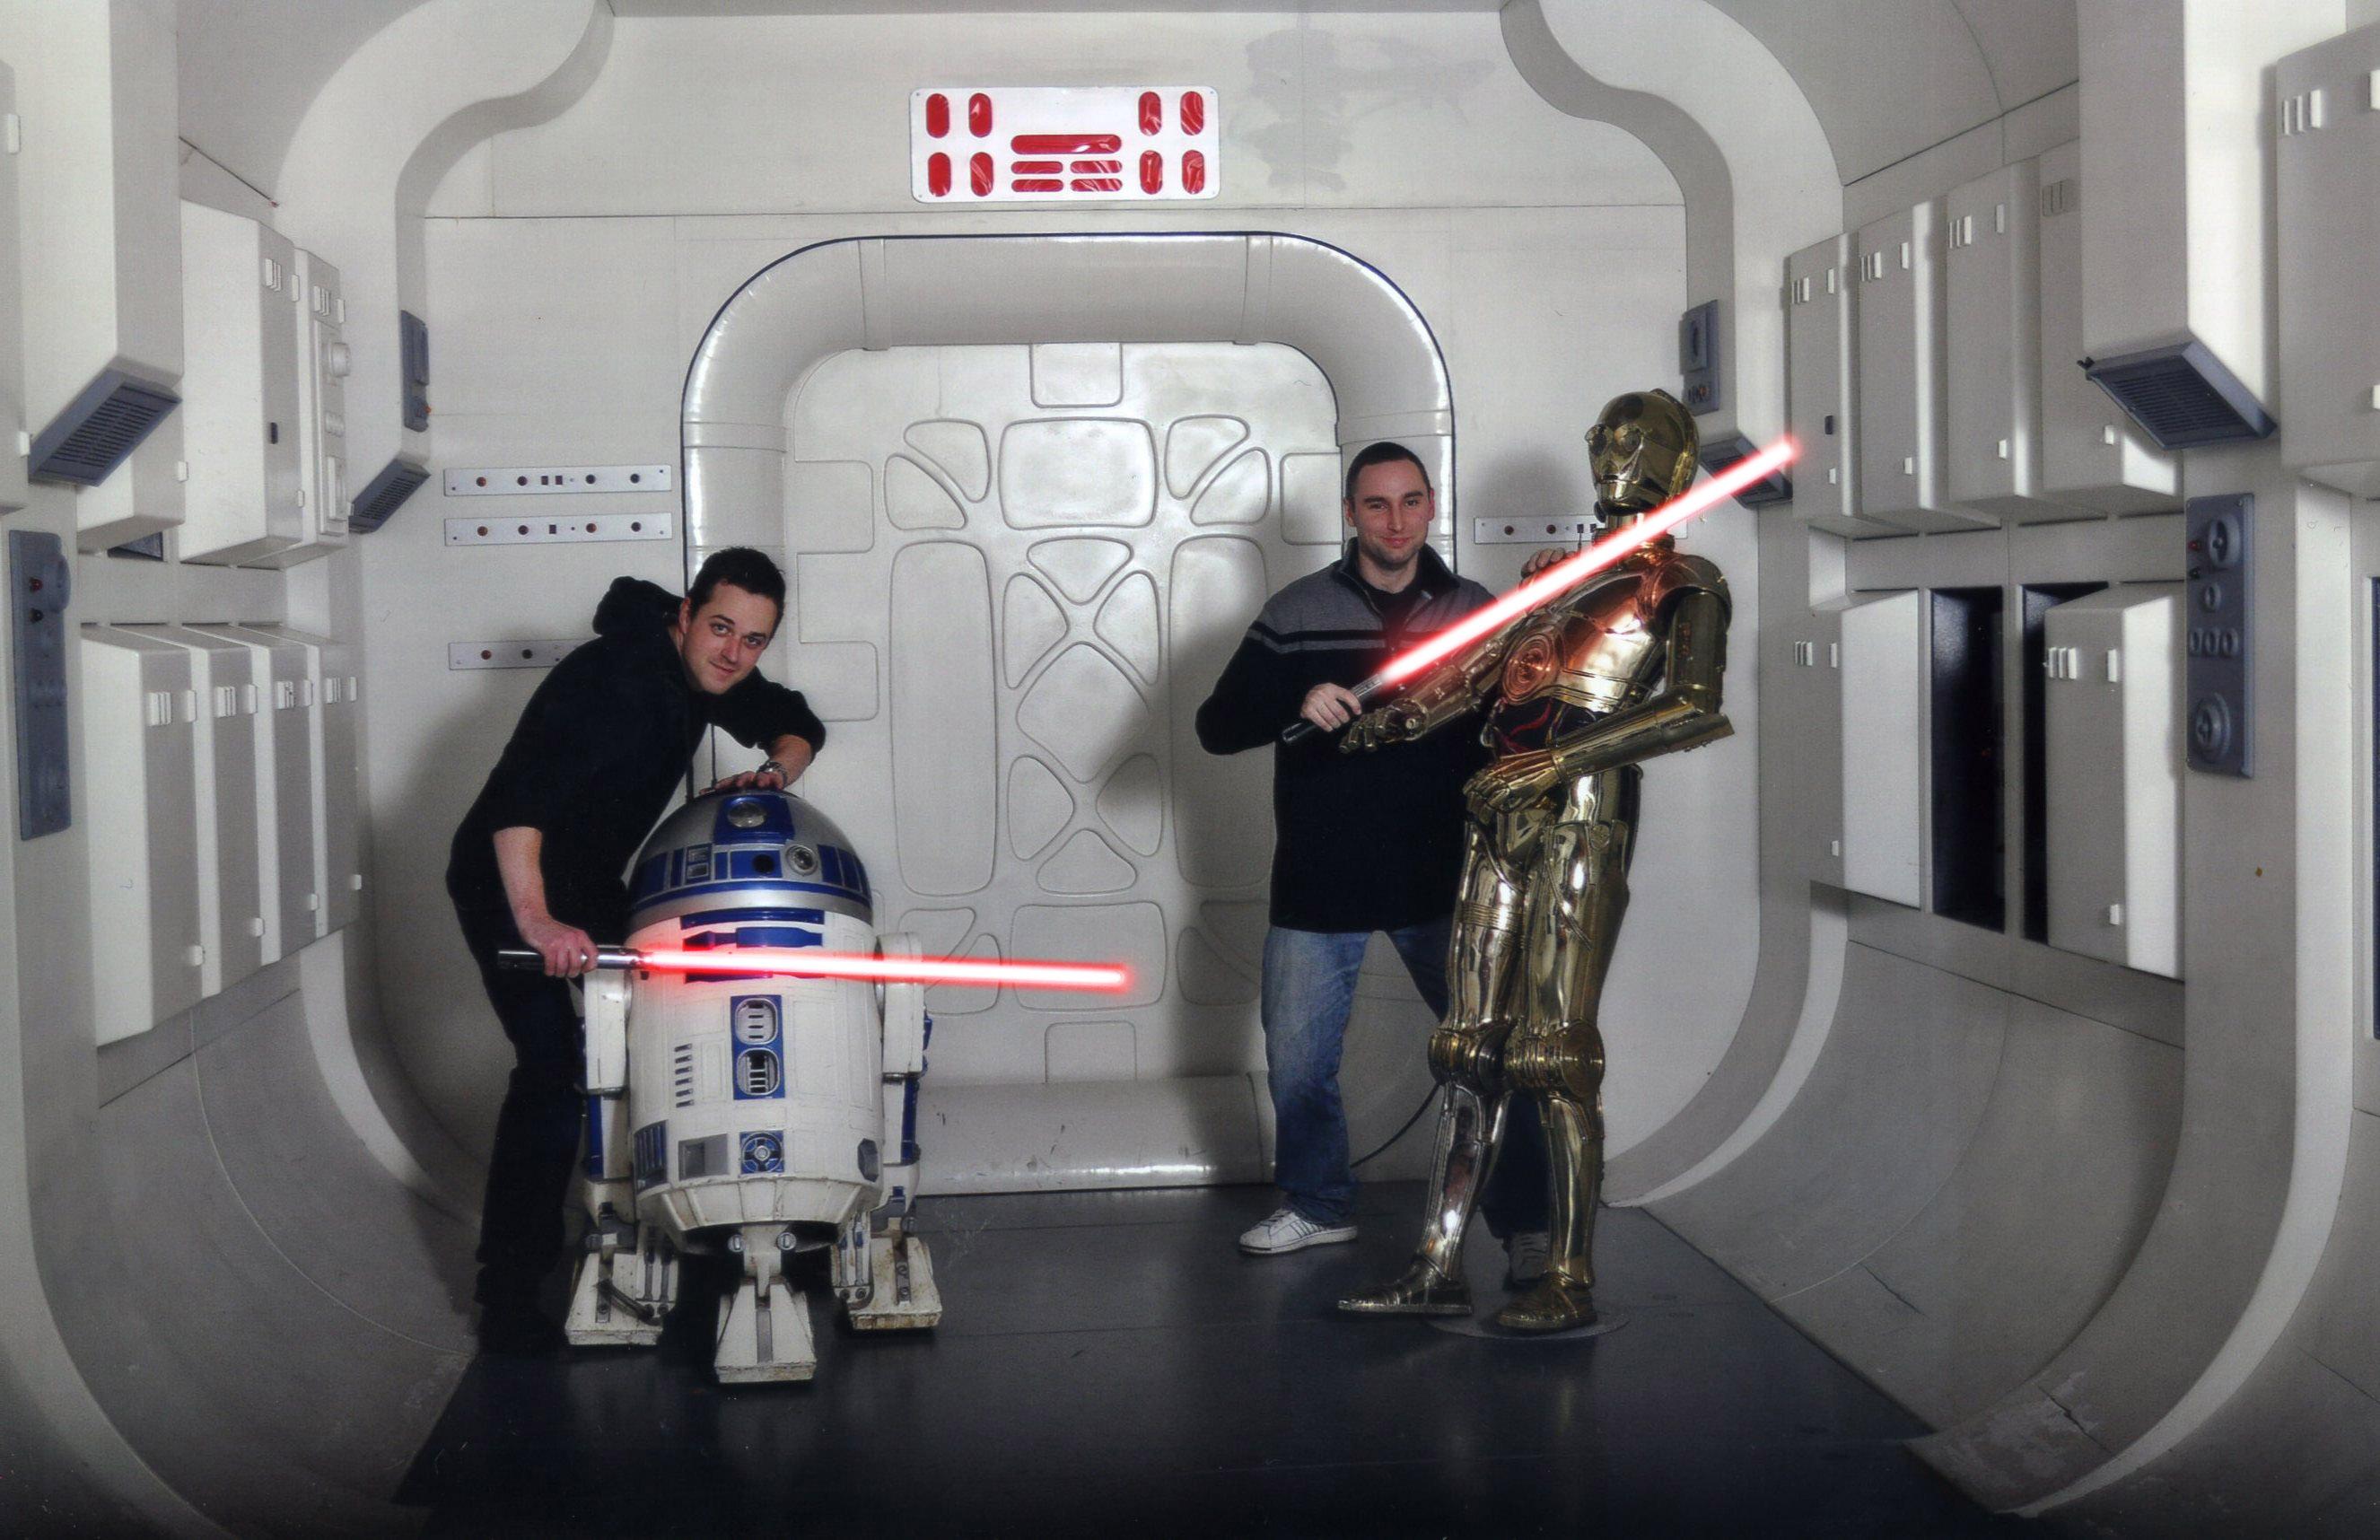 Star Wars Set Beyond The Movies